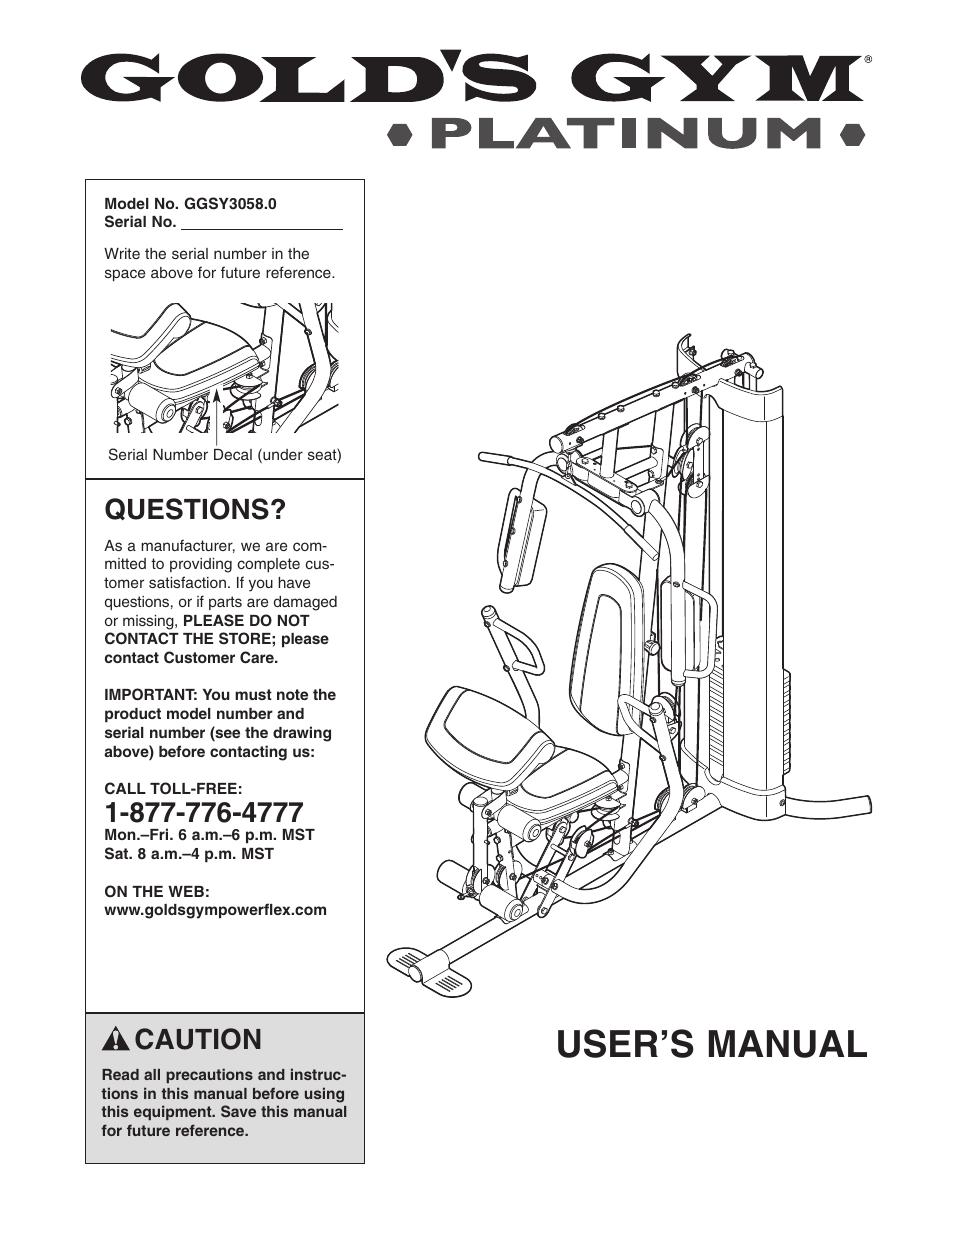 Version 11.5 Beginners Guide - Texthelp